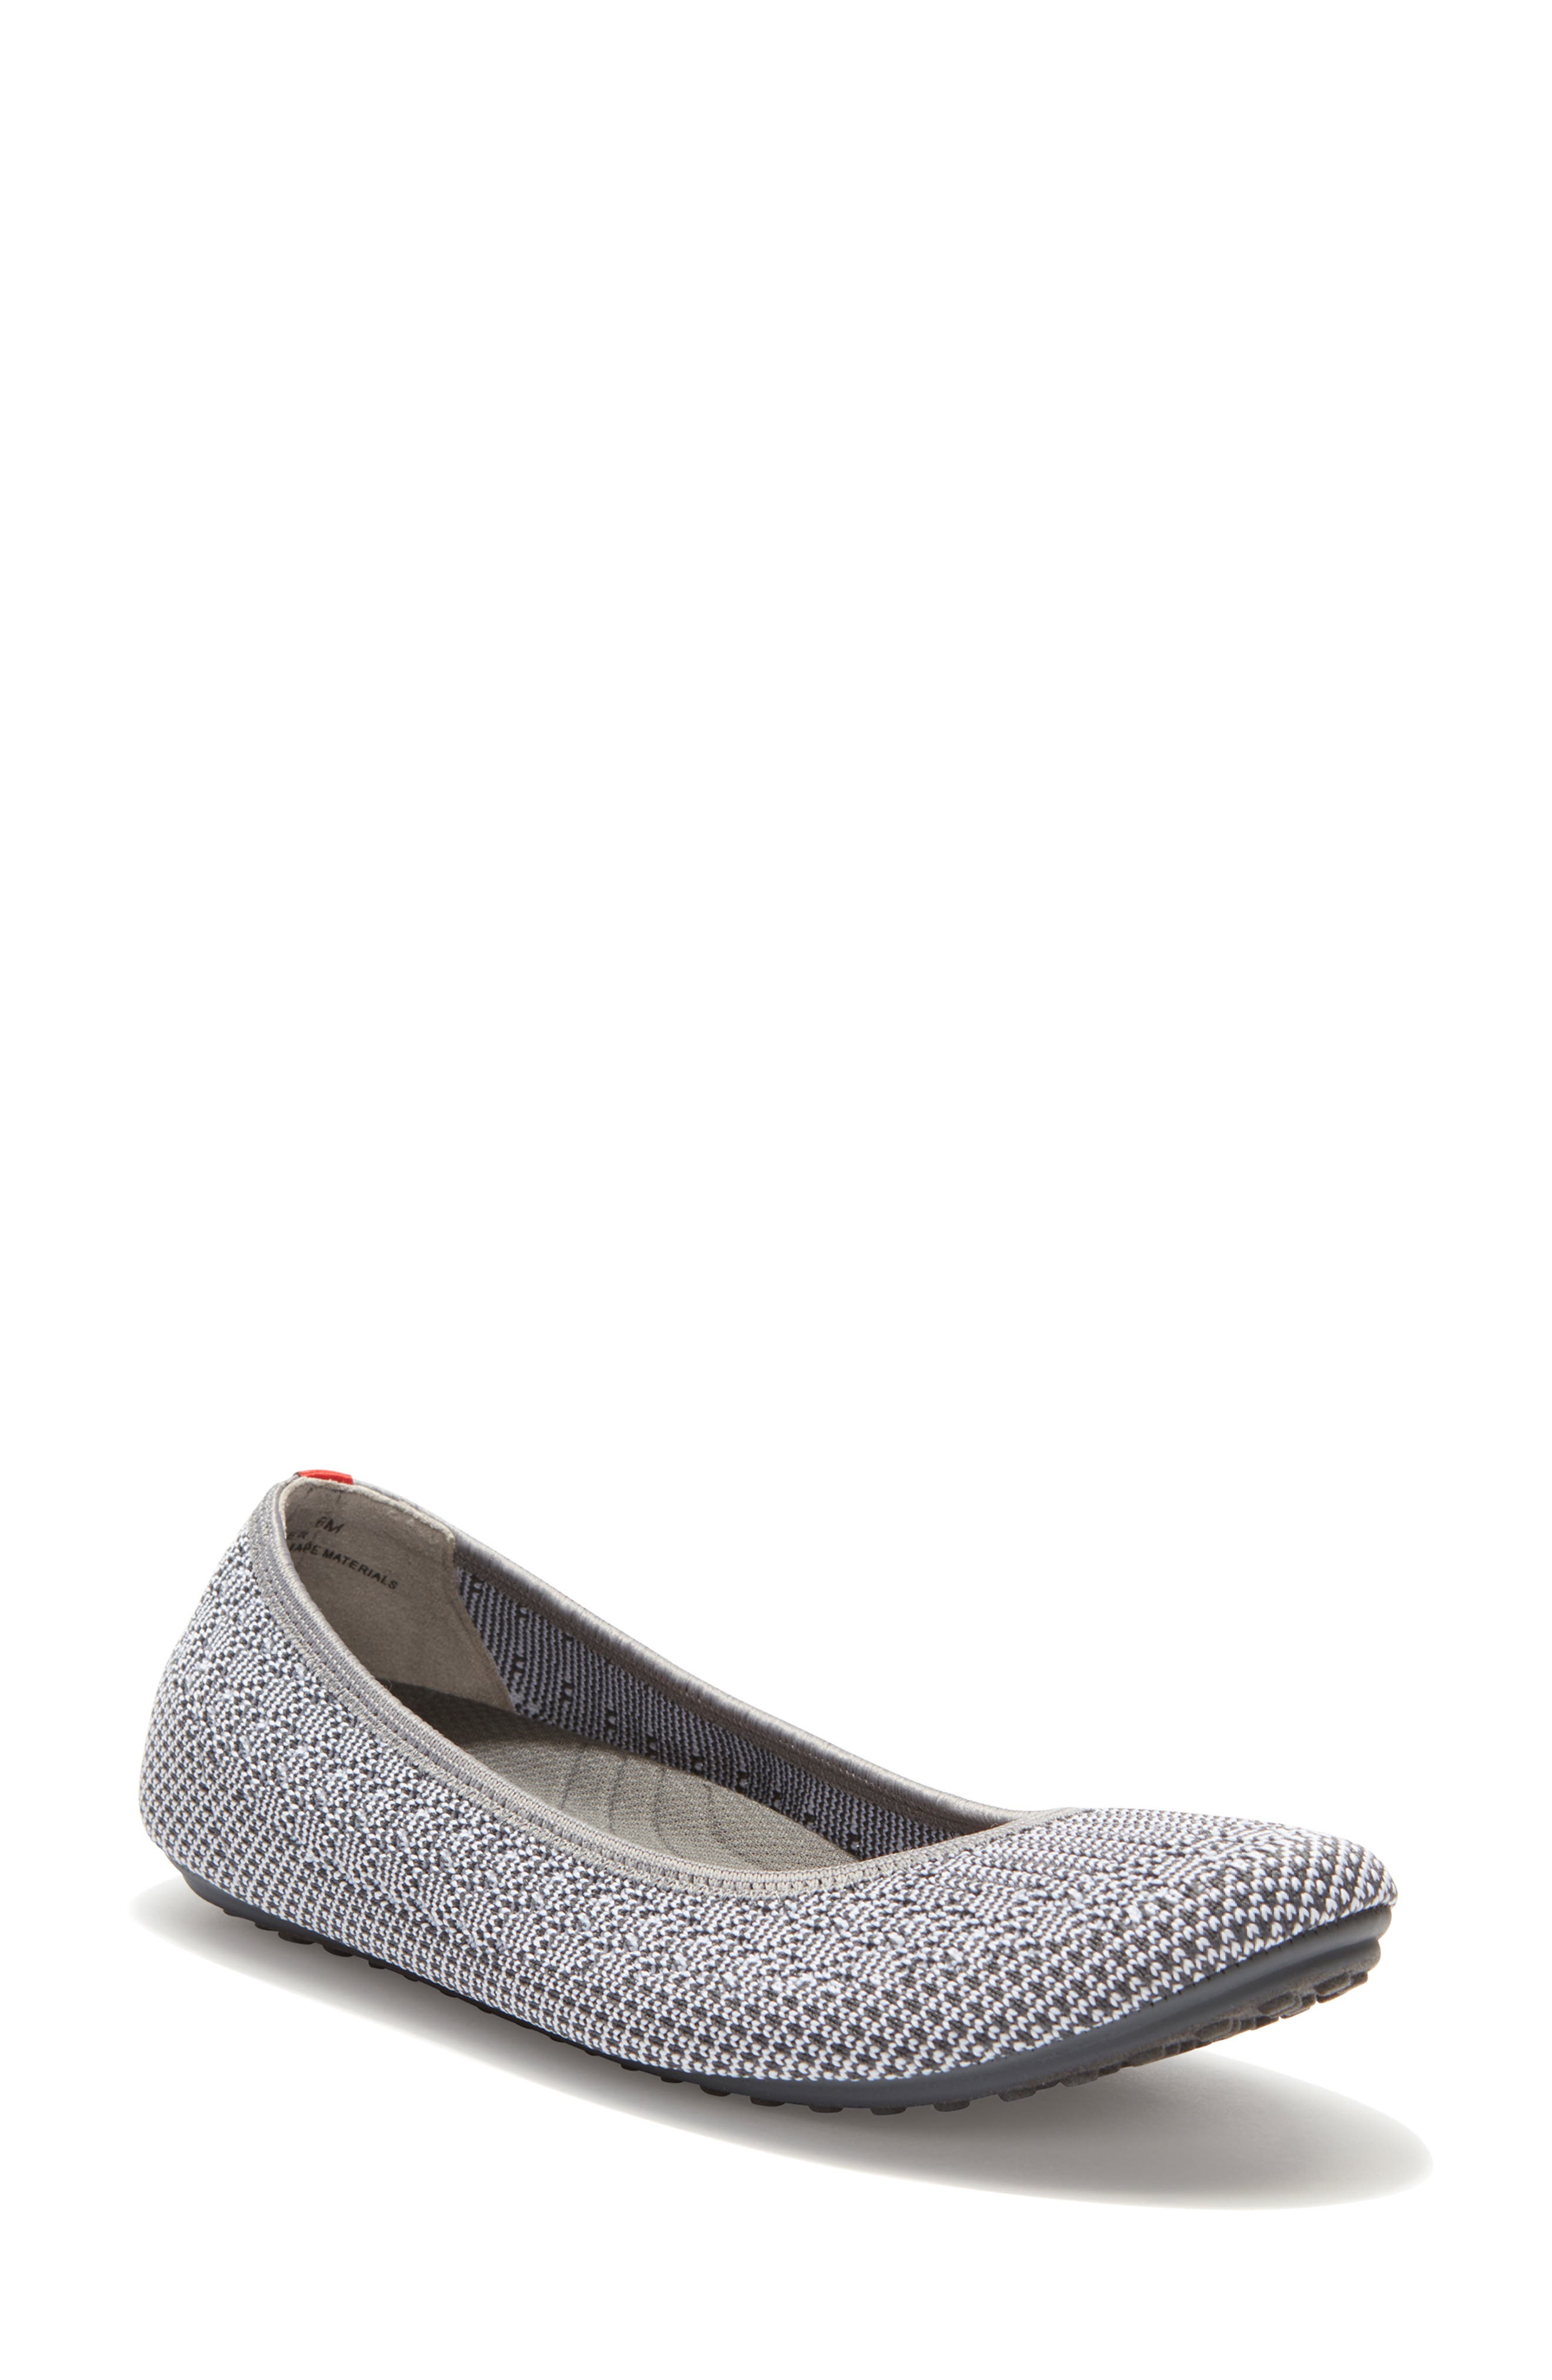 Adam Tucker Kaila Ballet Flat, Grey